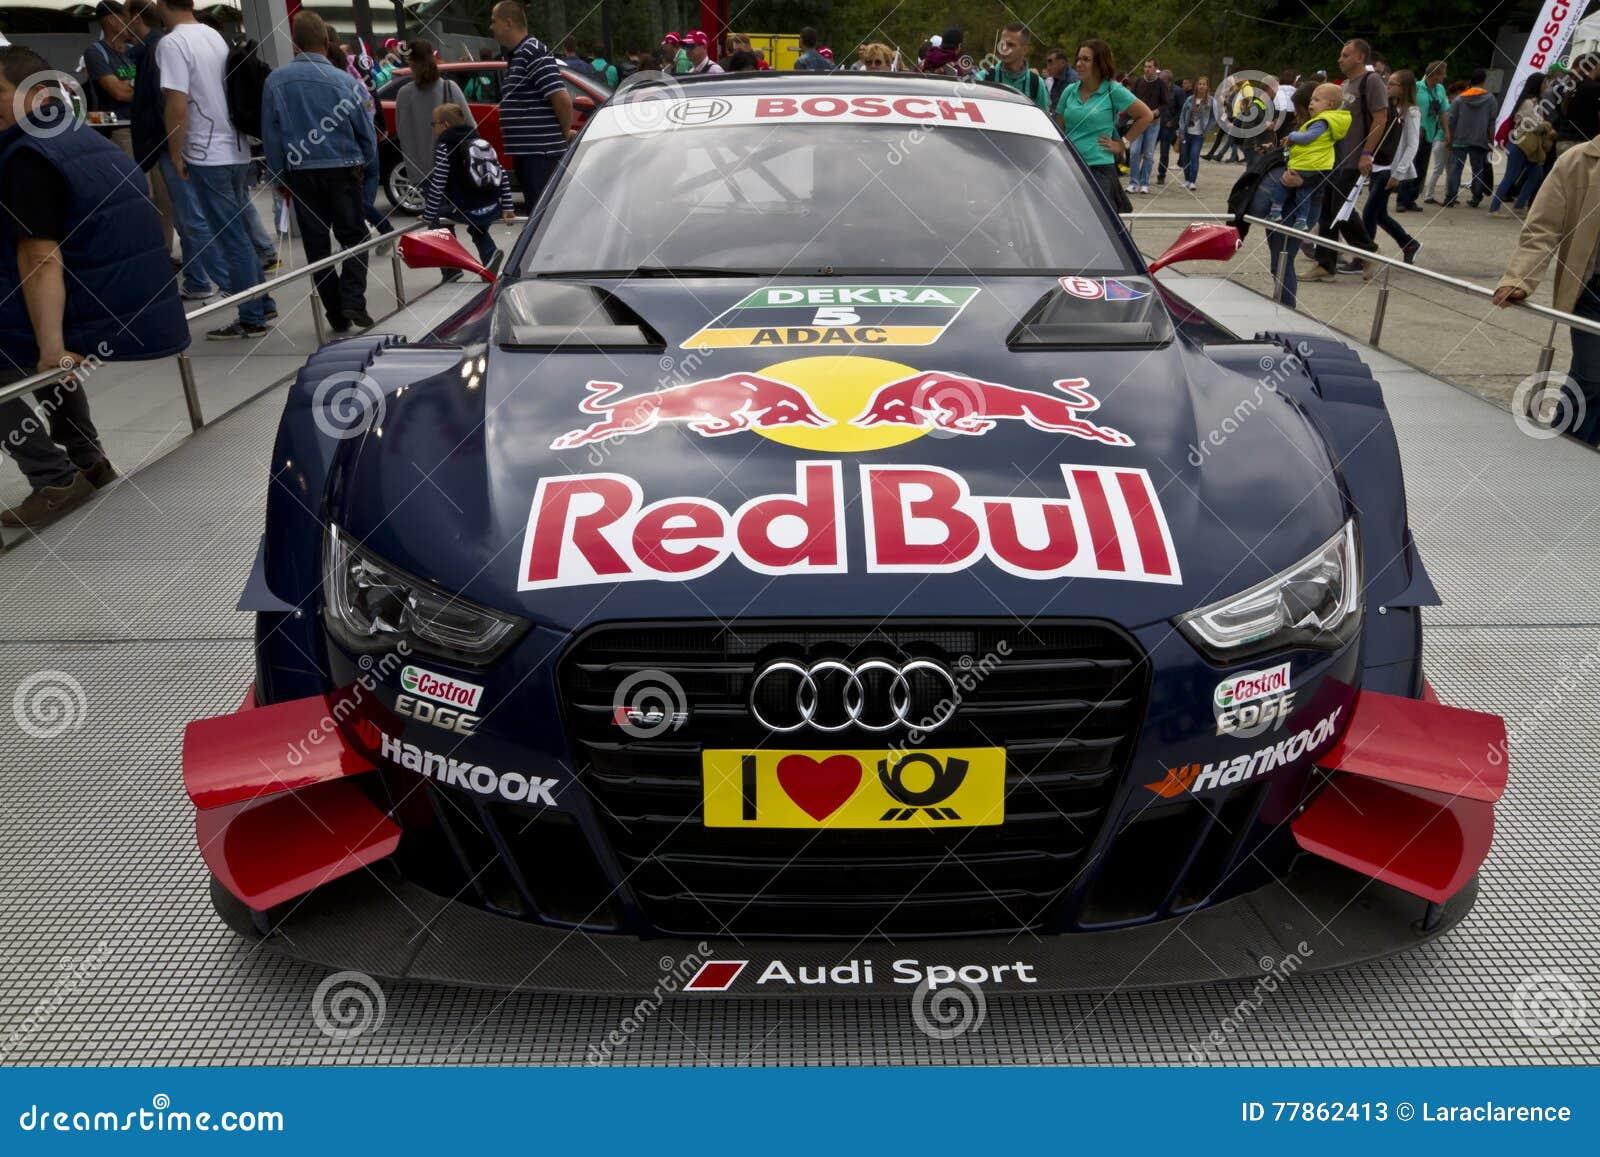 Audi-Rennwagen an der Ausstellung